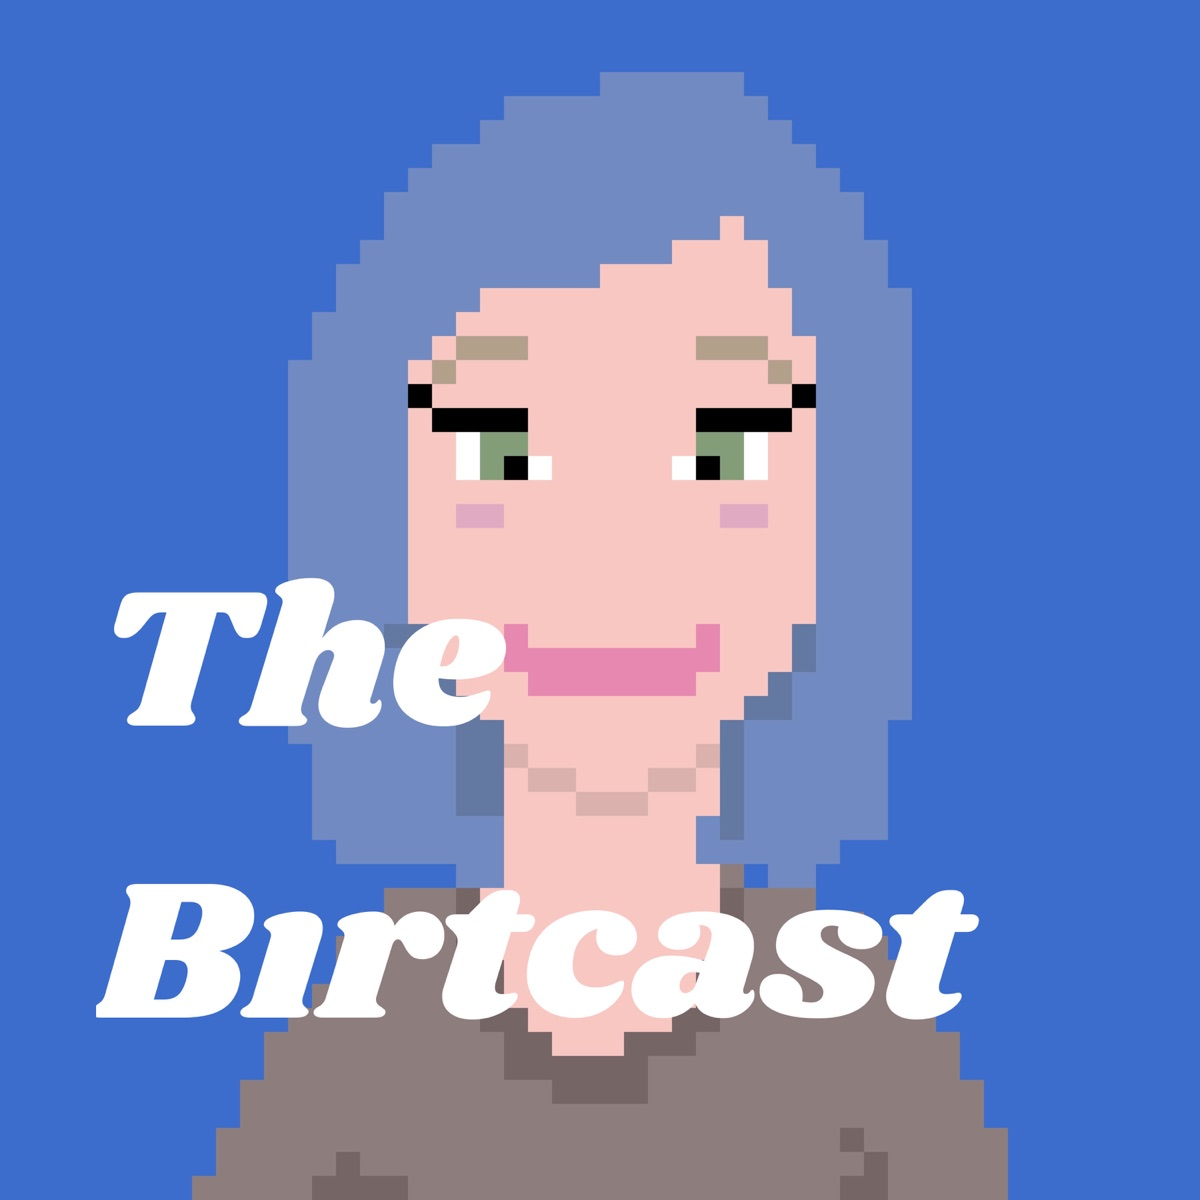 The Bırtcast